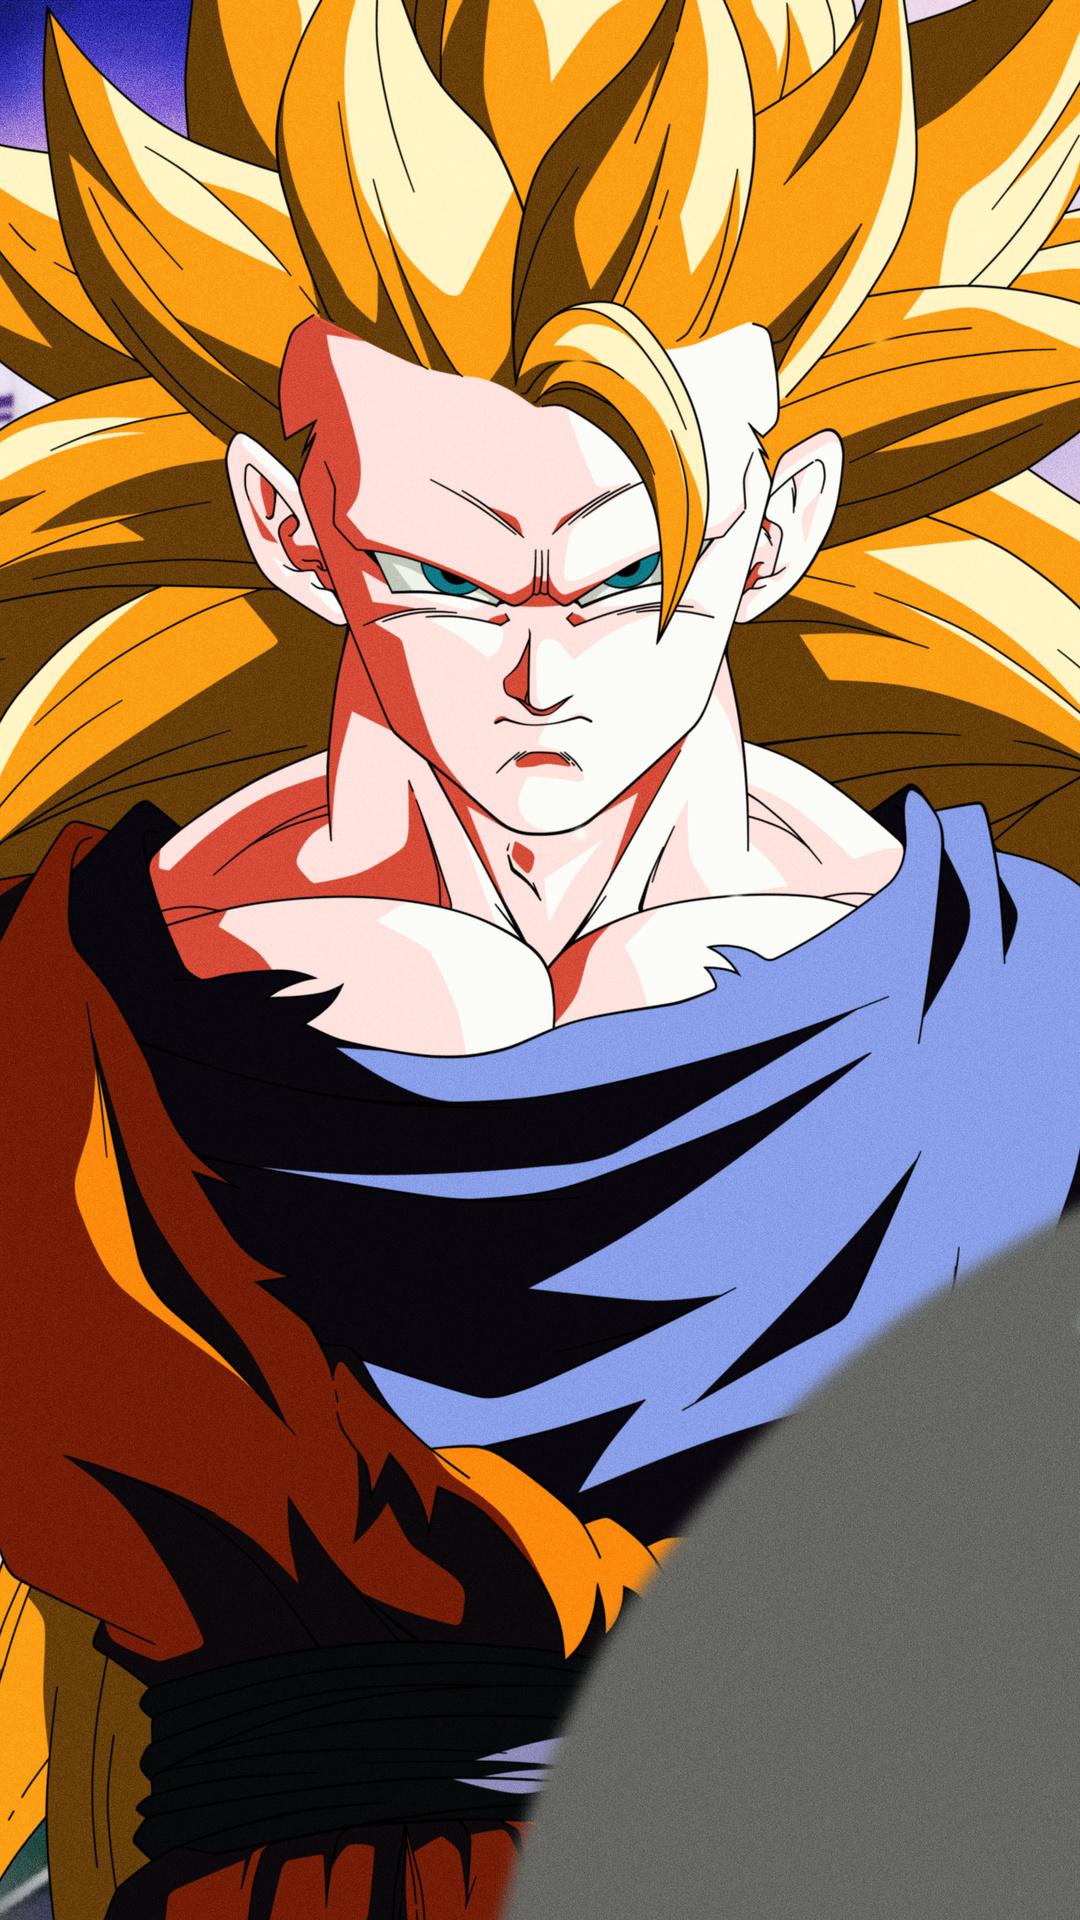 1080x1920 Son Goku Dragon Ball Super 5k Artwork Iphone 76s